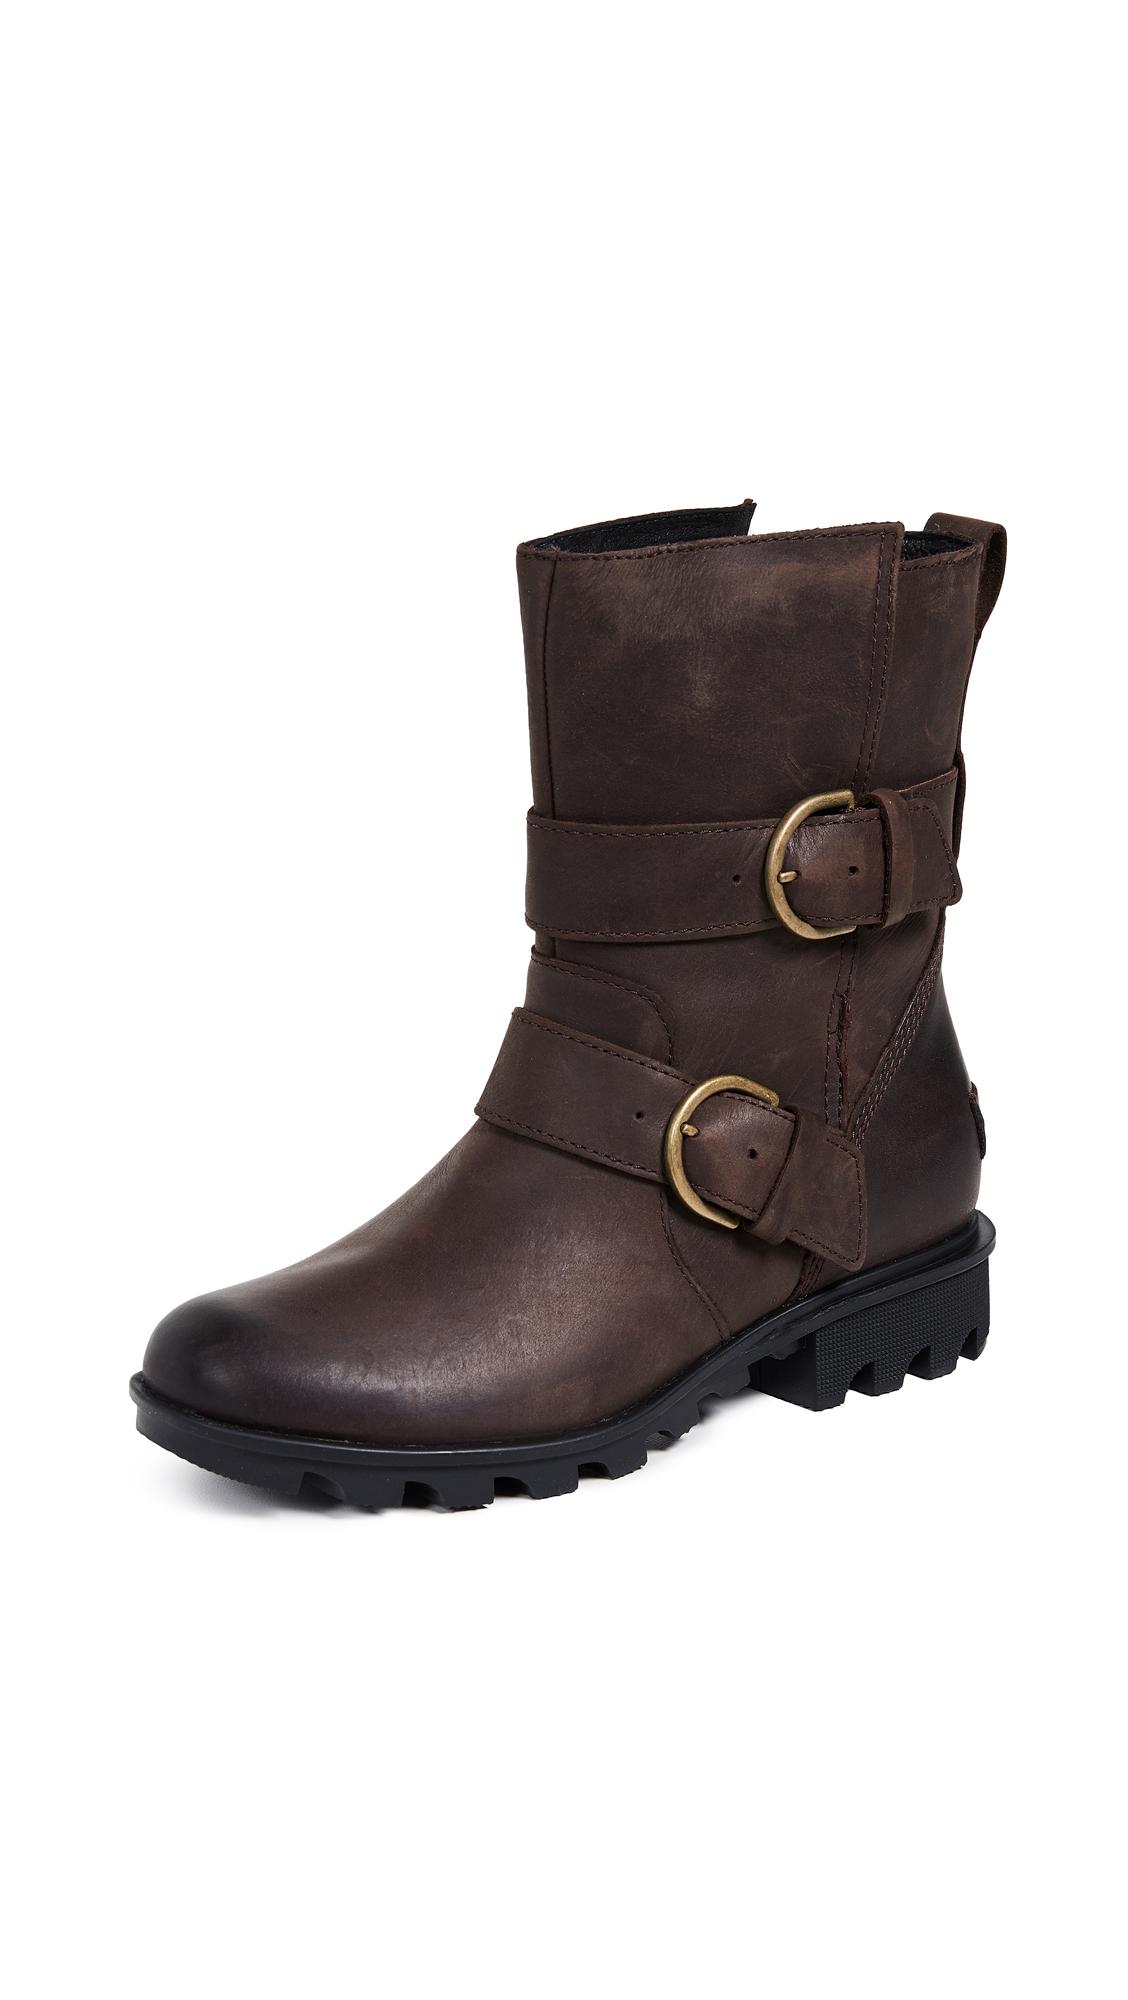 Sorel Phoenix Moto Boots - Ready/Cattail